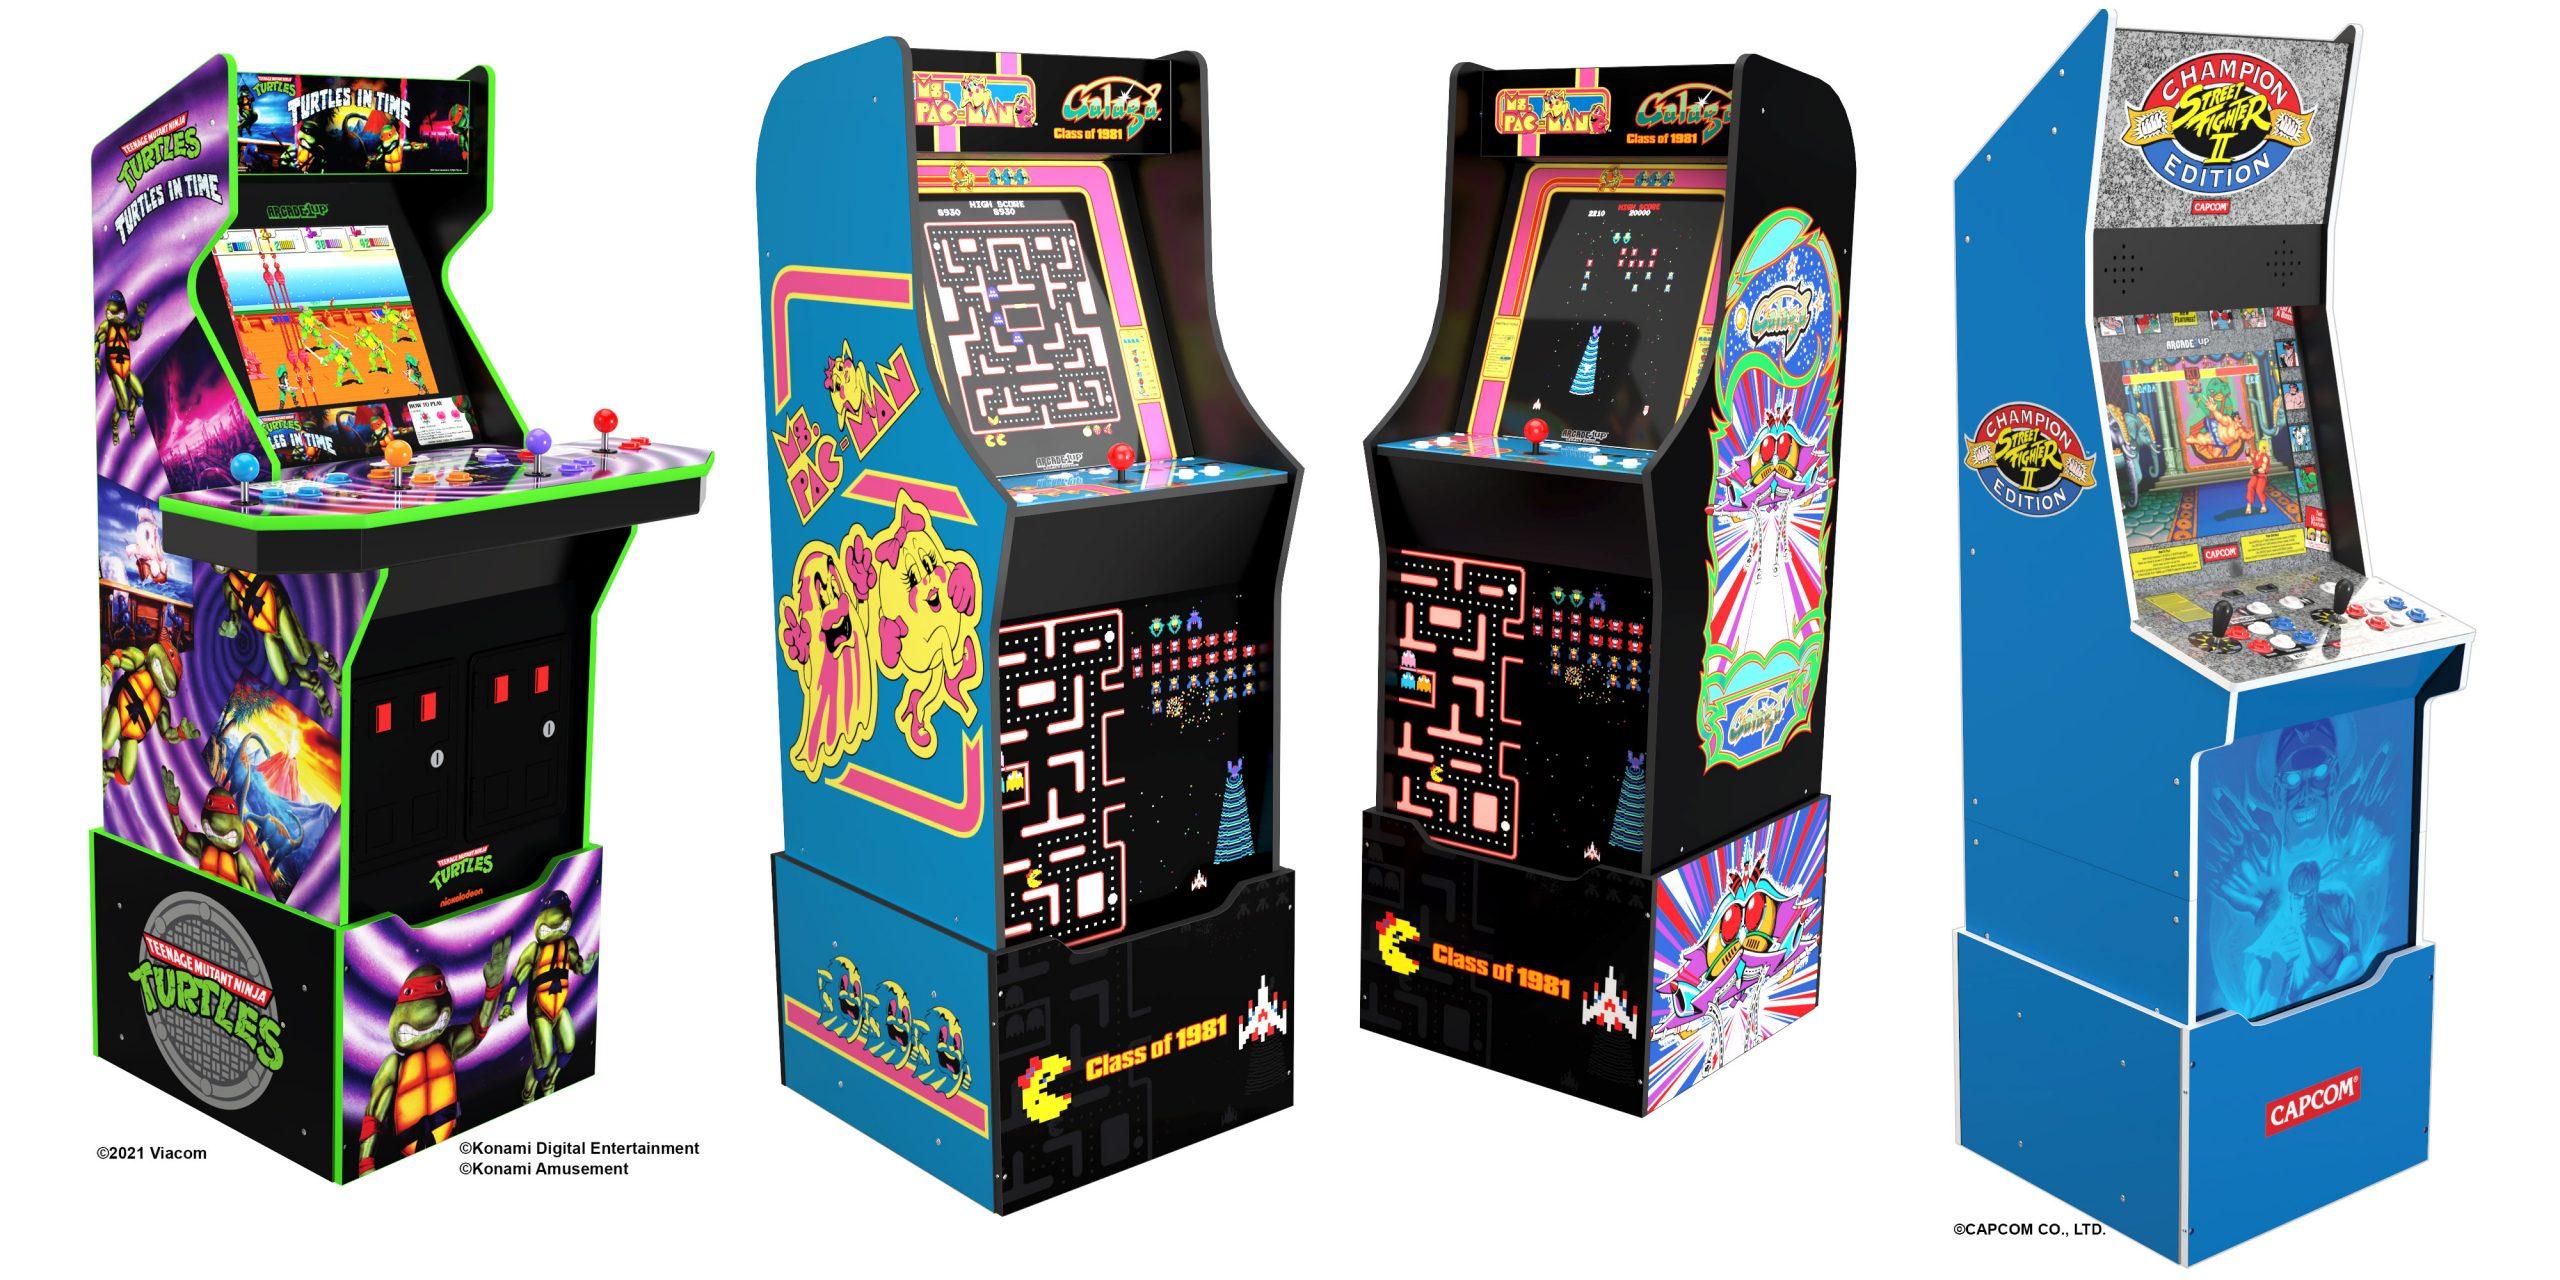 Street Fighter II arcade cabinet